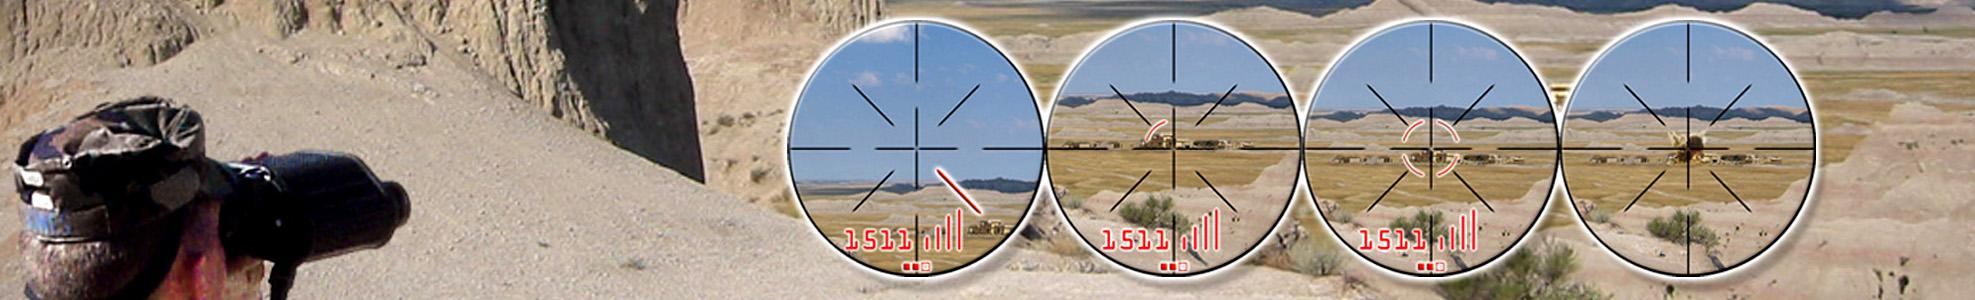 Laser Spot Tracking